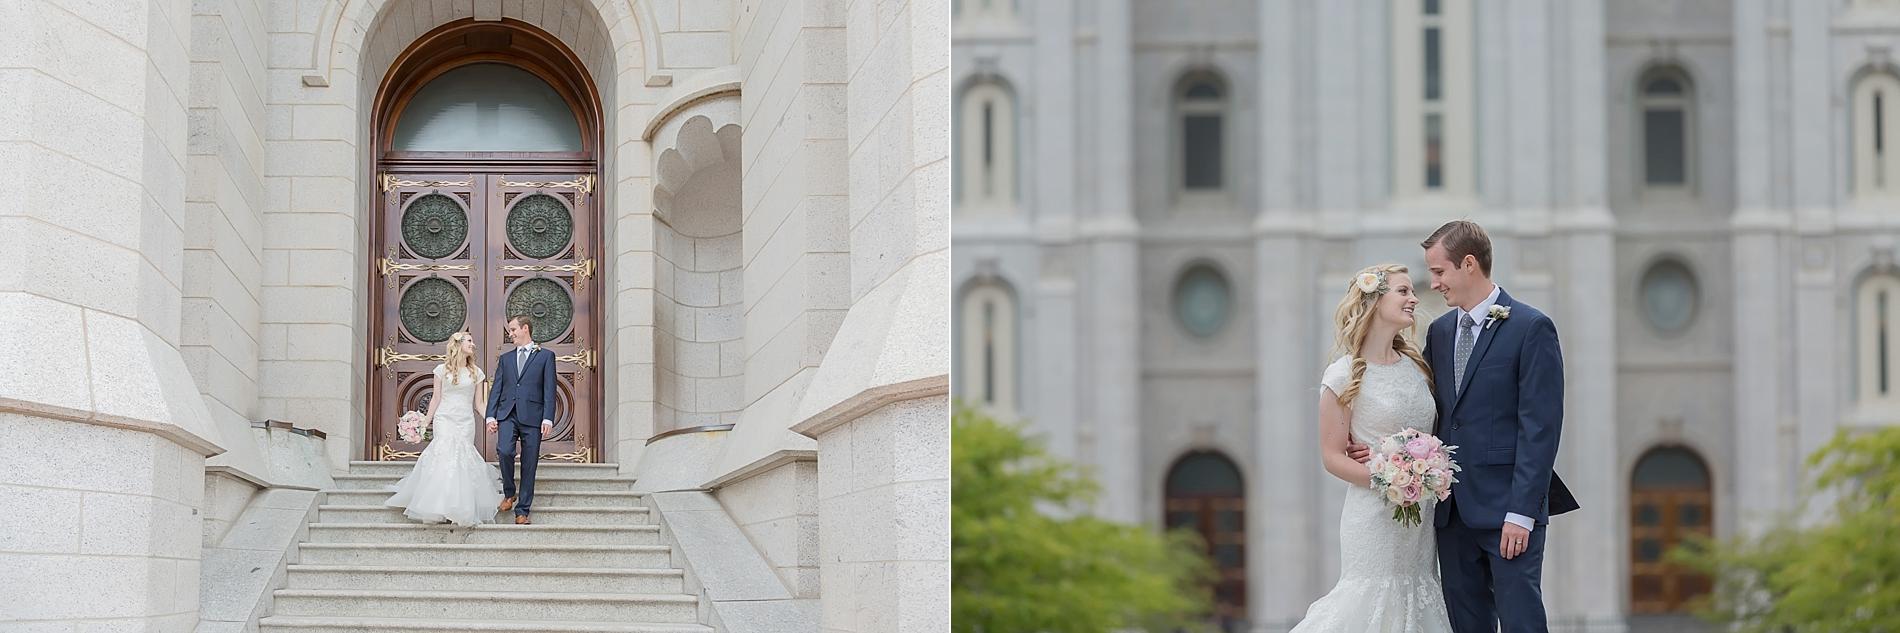 SLC-lds-temple-wedding-6